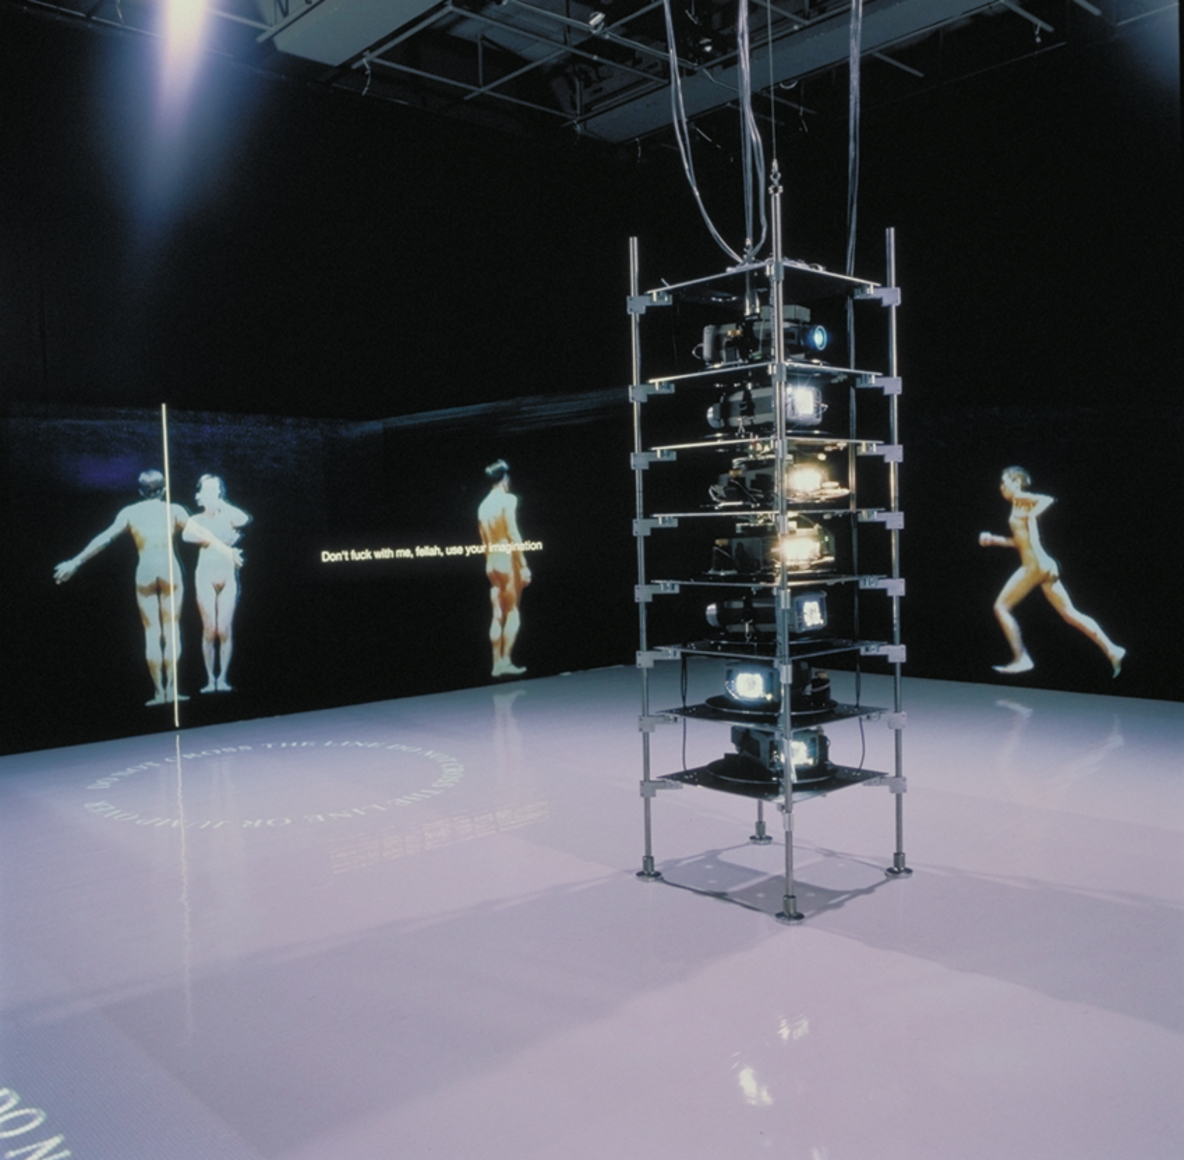 Teiji Furuhashi, Lovers, 1994. MoMA, New York (c) 2016 Dumb Type